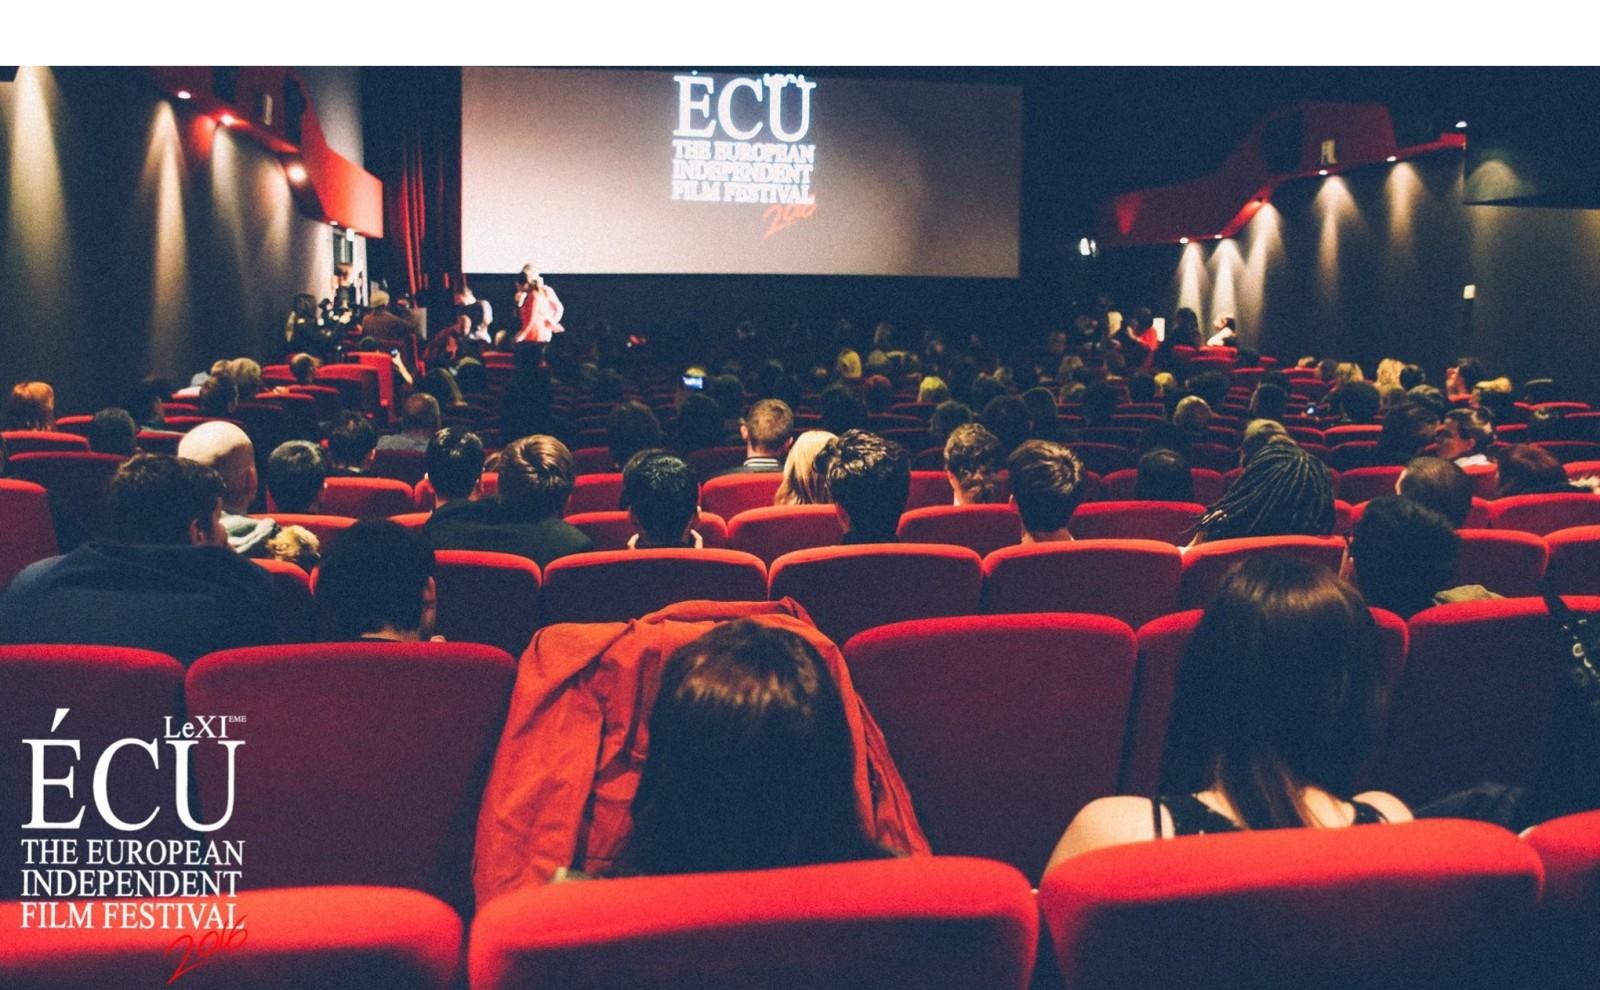 SVELATA LA SELEZIONE UFFICIALE DI ÉCU – THE EUROPEAN INDEPENDENT FILM FESTIVAL